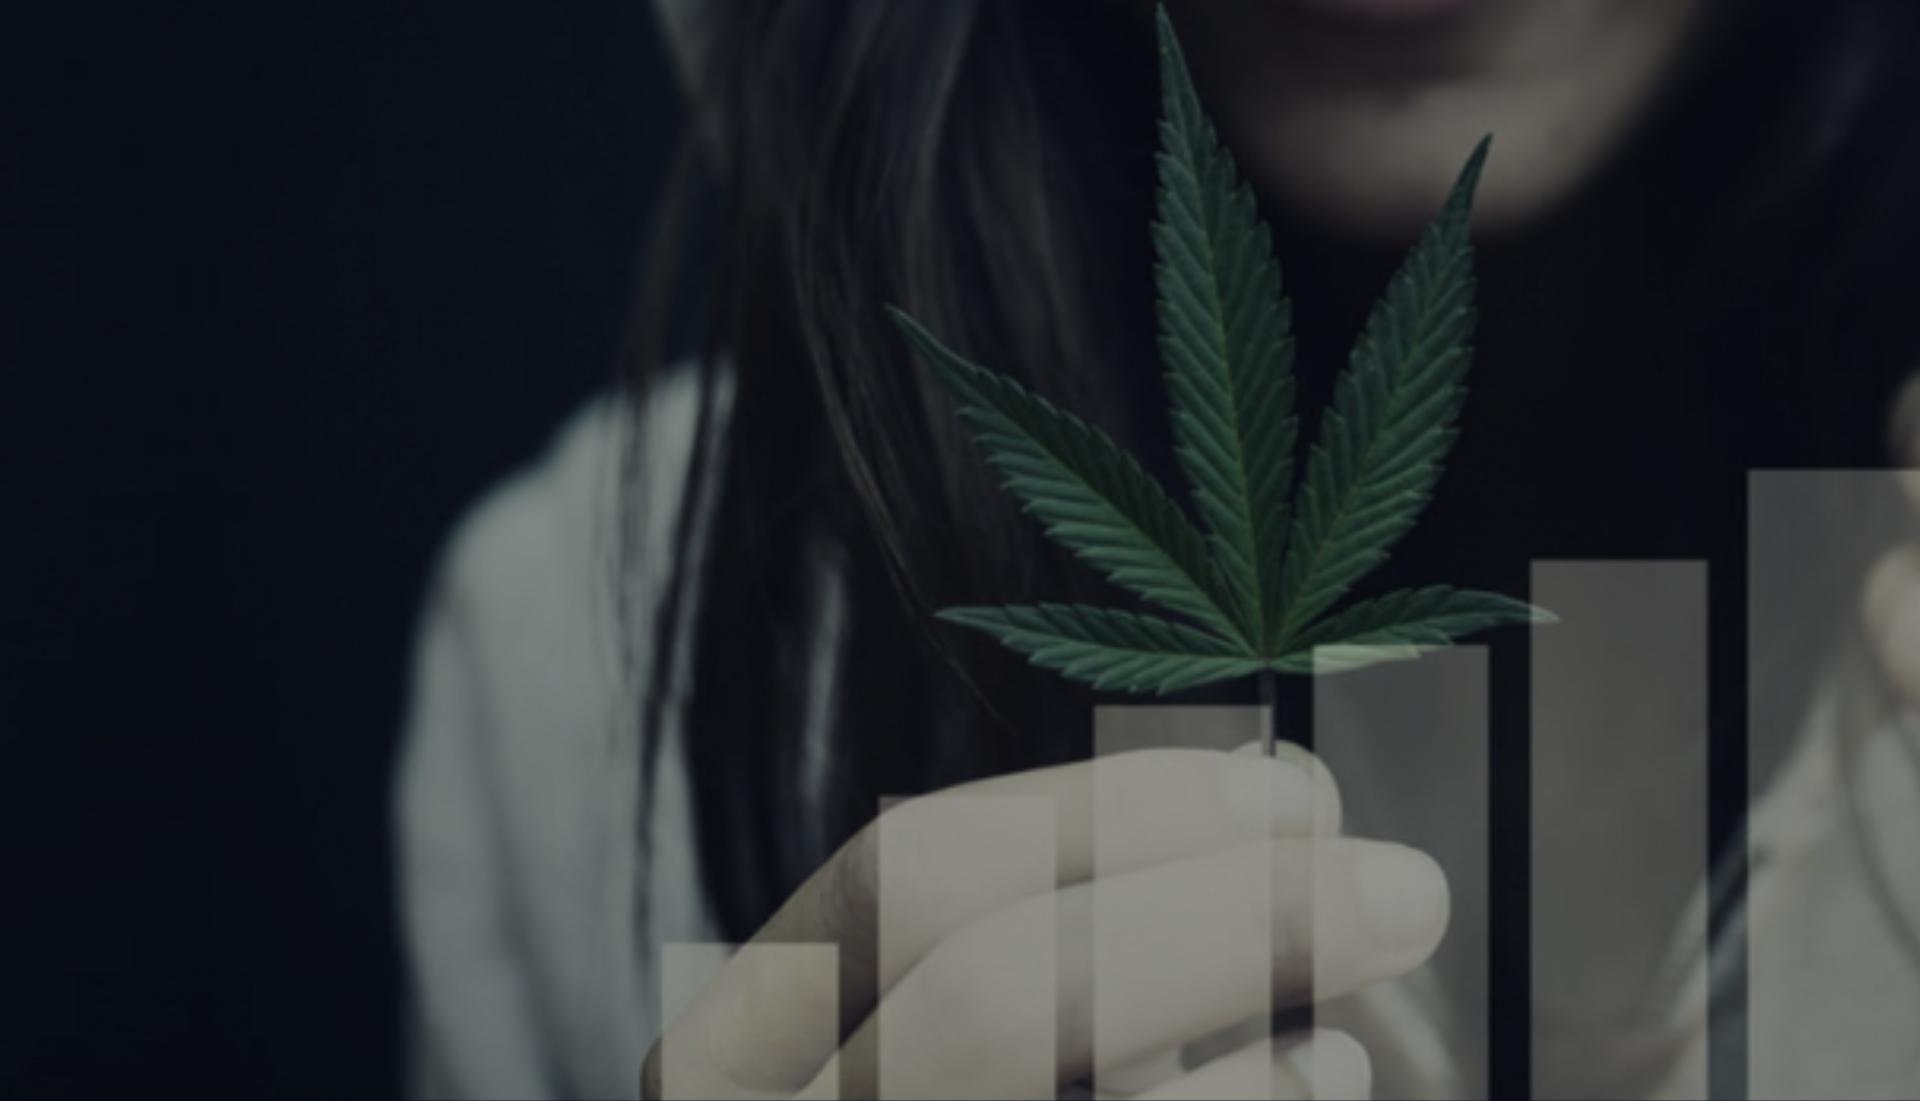 cannabis business growth chart, leaf, woman